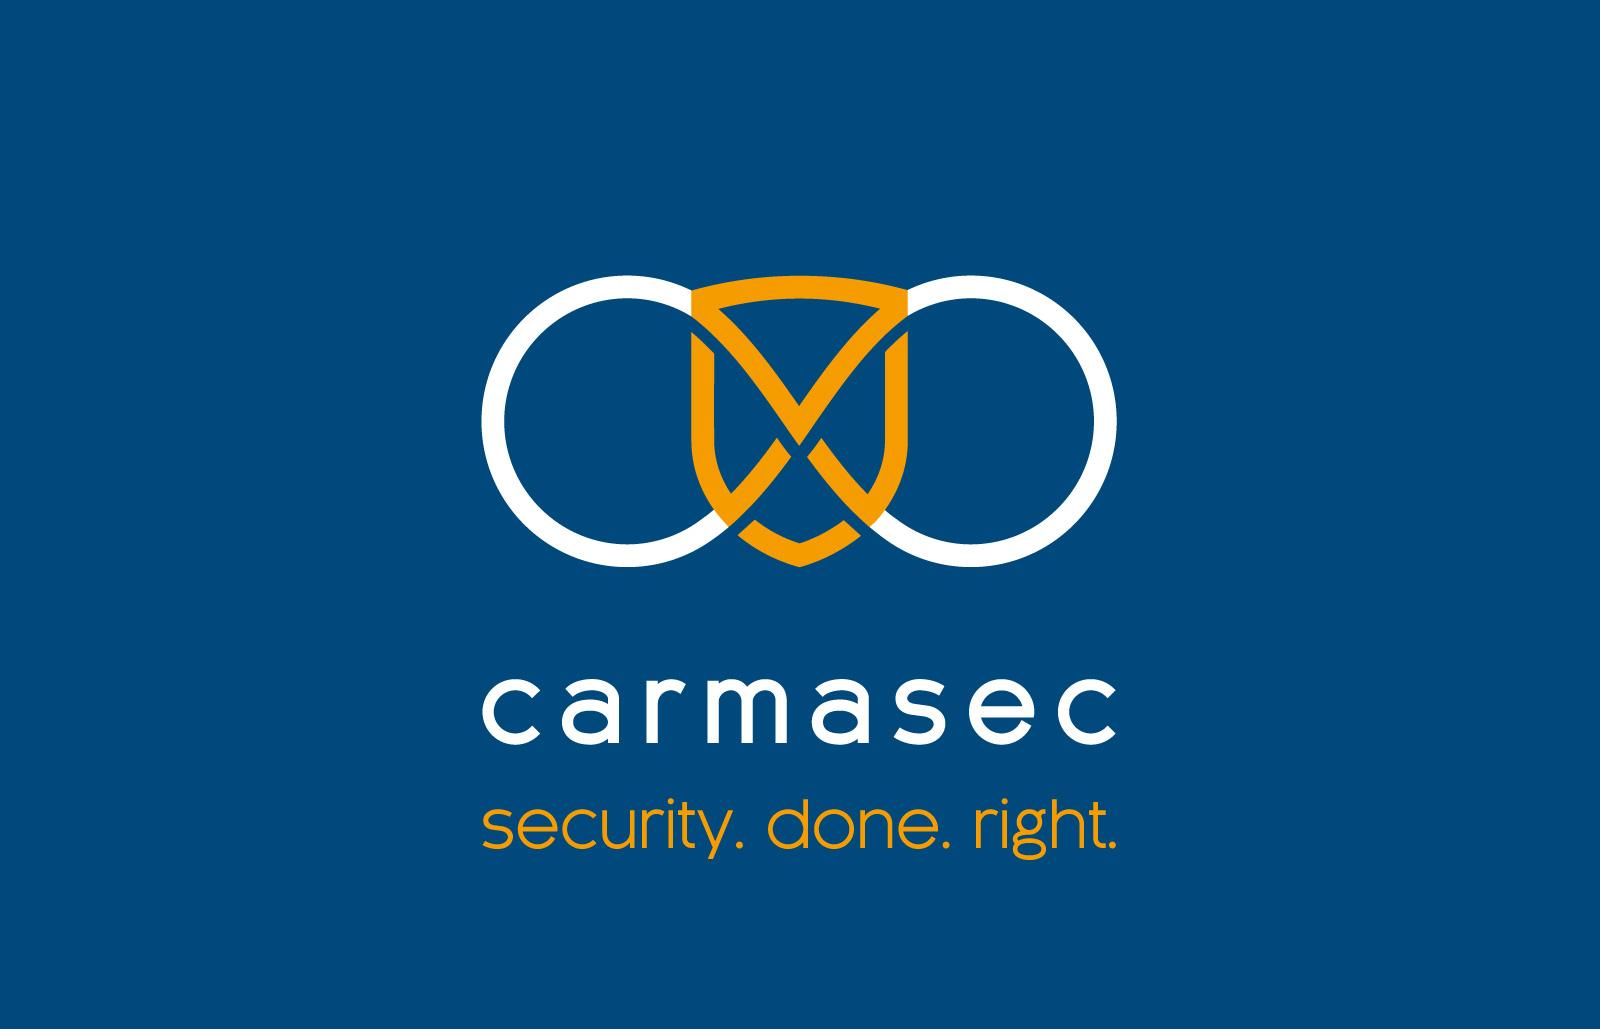 carmasec GmbH & Co. KG.